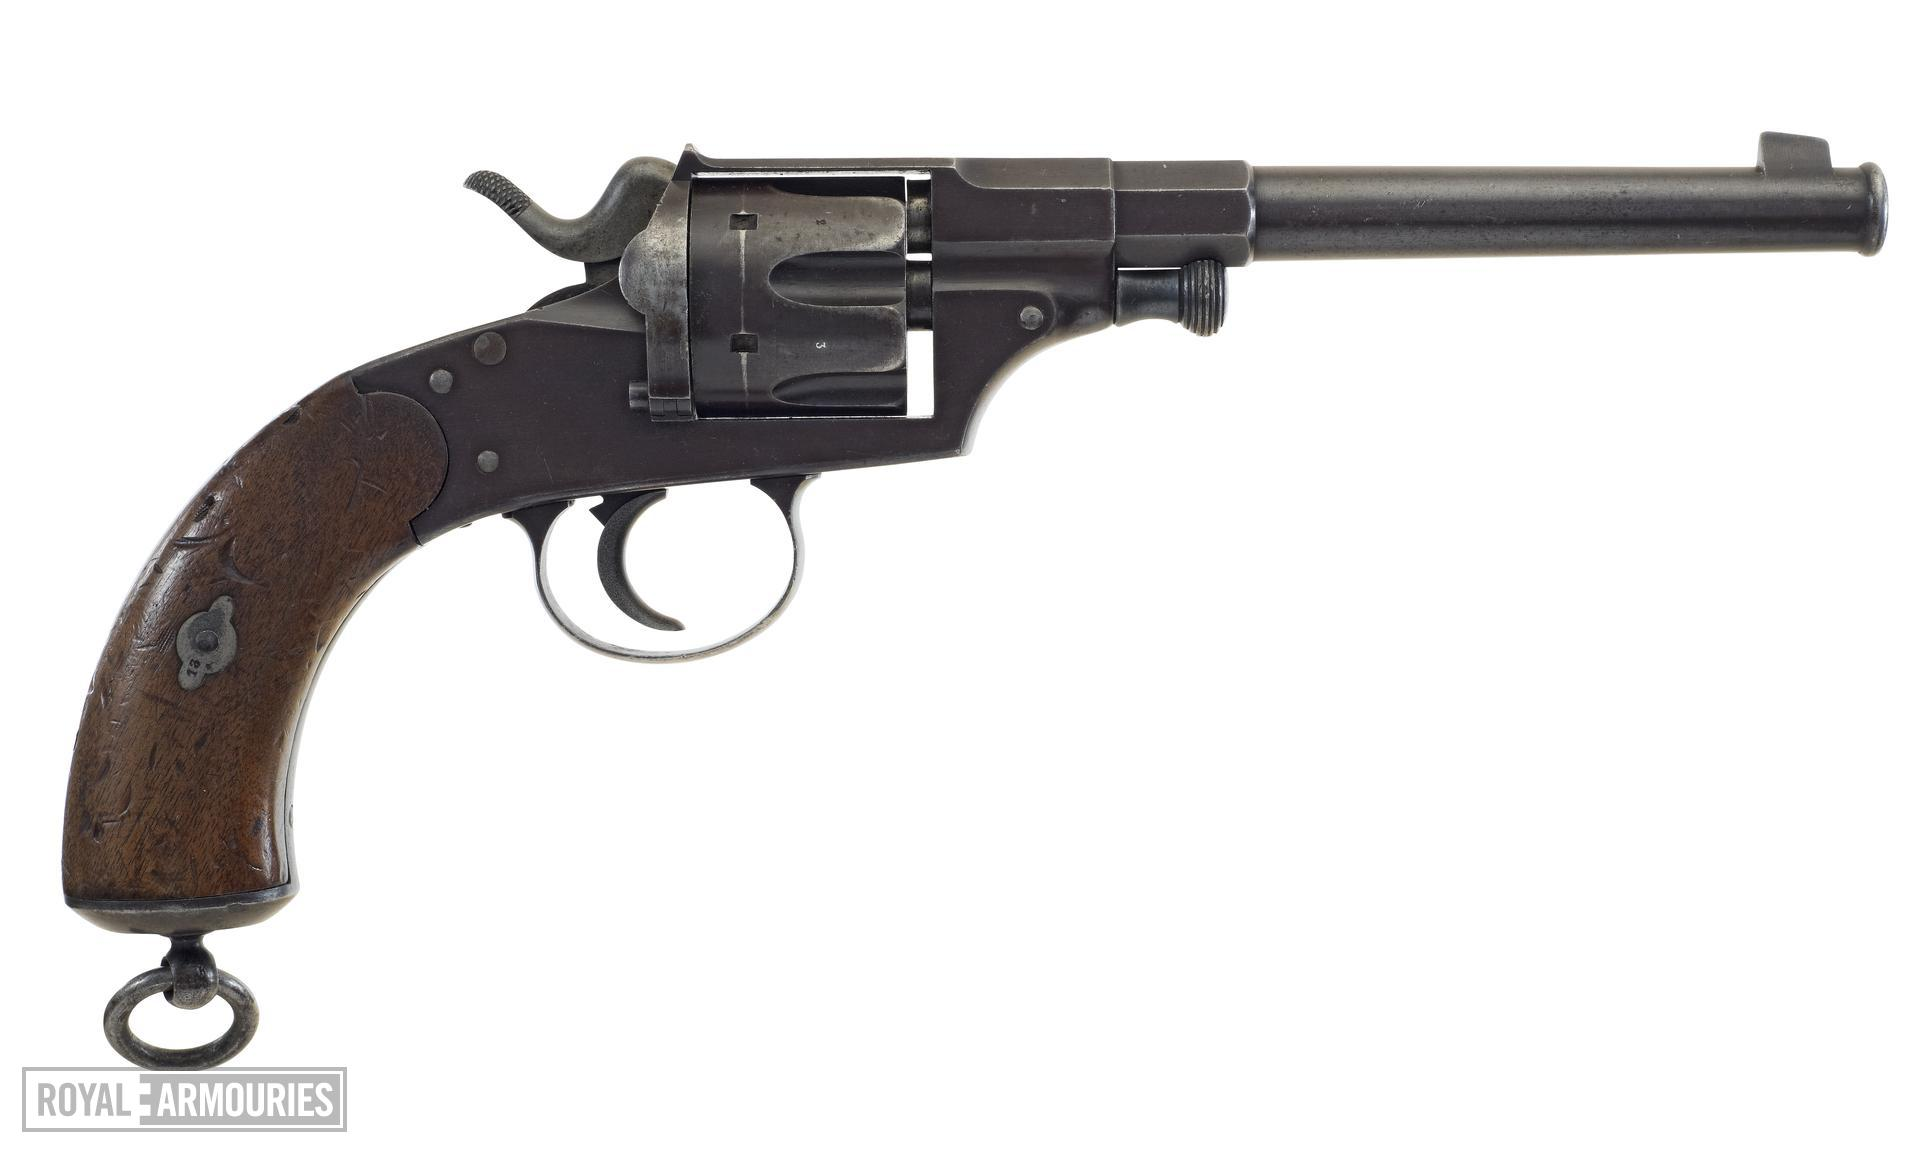 Centrefire six-shot revolver - Ordnance Model 79 Also known as a Reichsrevolver.